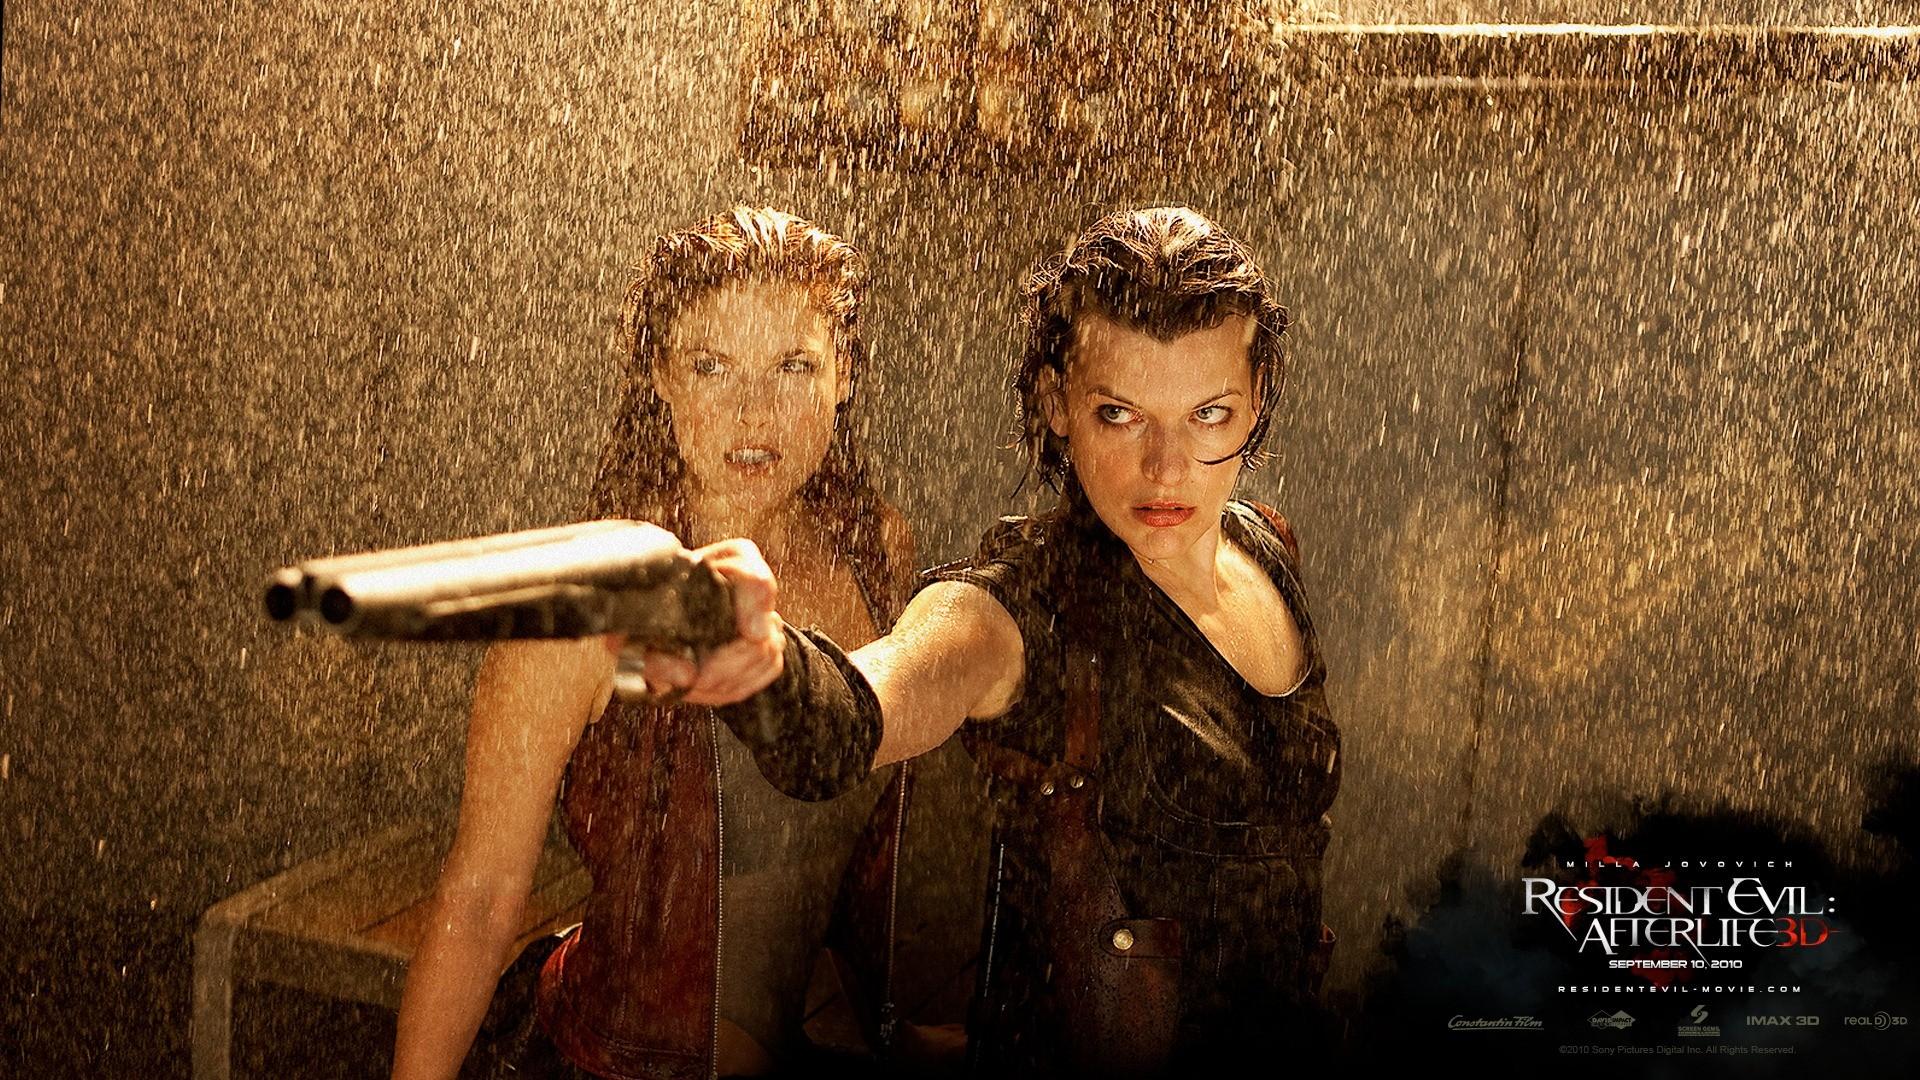 81 Resident Evil: Retribution HD Wallpapers   Backgrounds